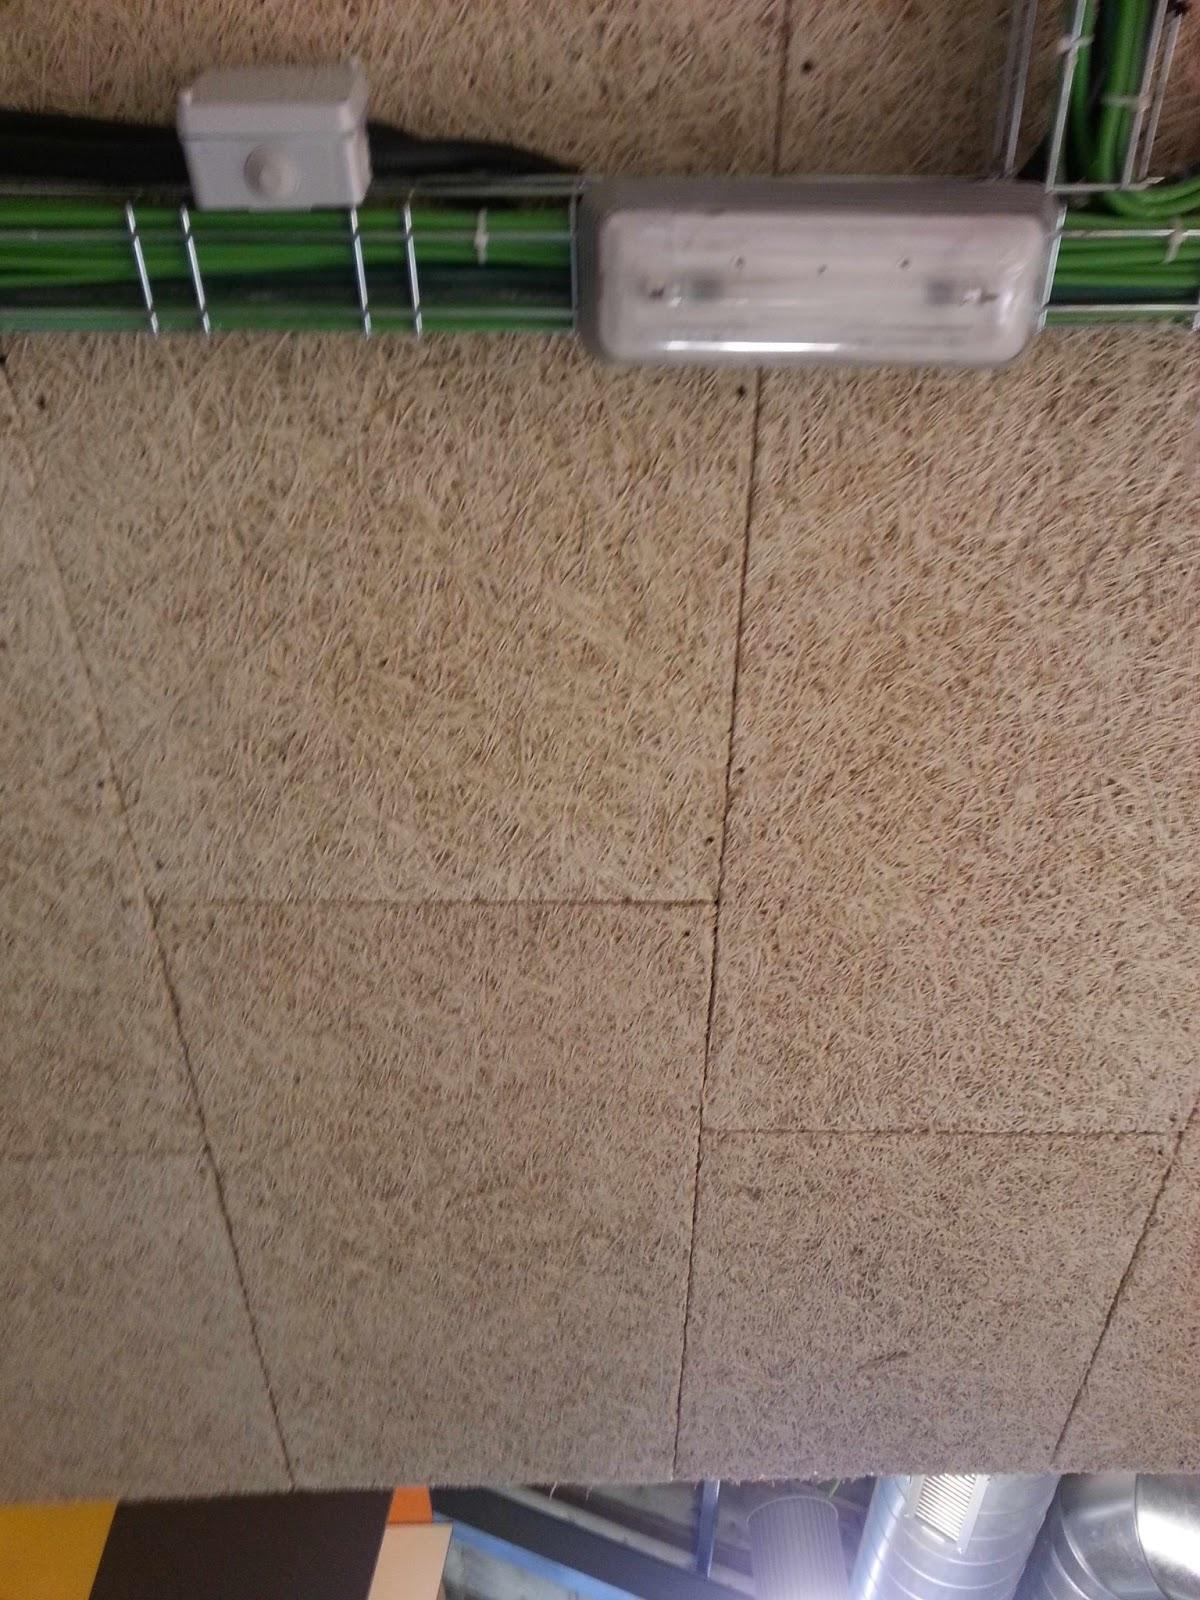 Aislamiento acustico paredes interiores - Aislantes termicos para paredes interiores ...